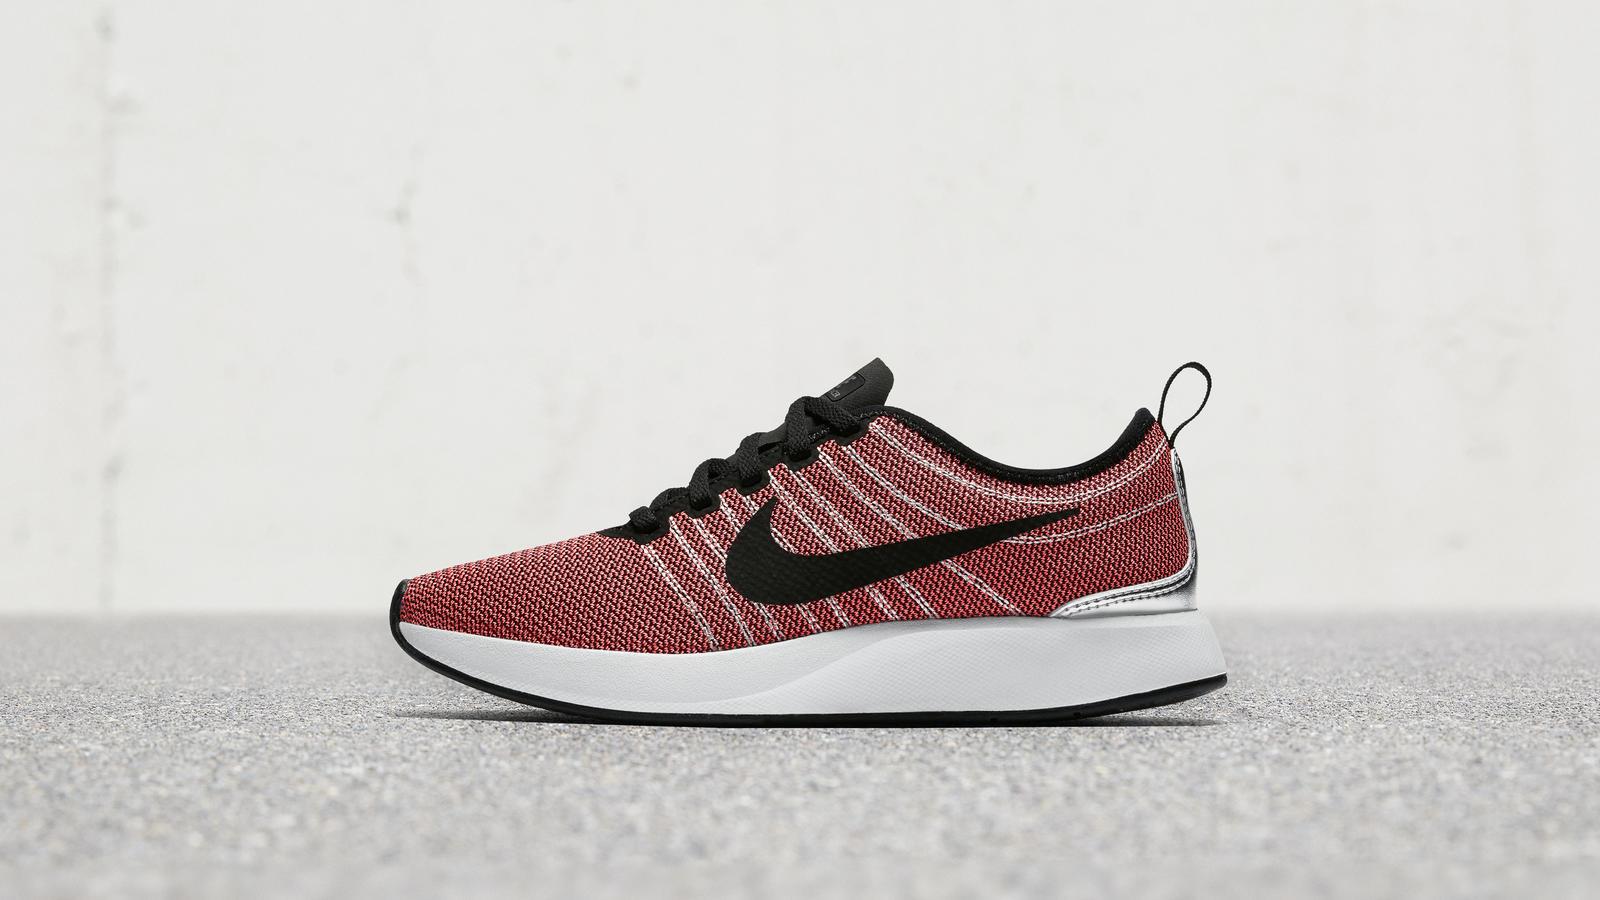 0d22bad52e62 Nike Dualtone Racer - Nike News